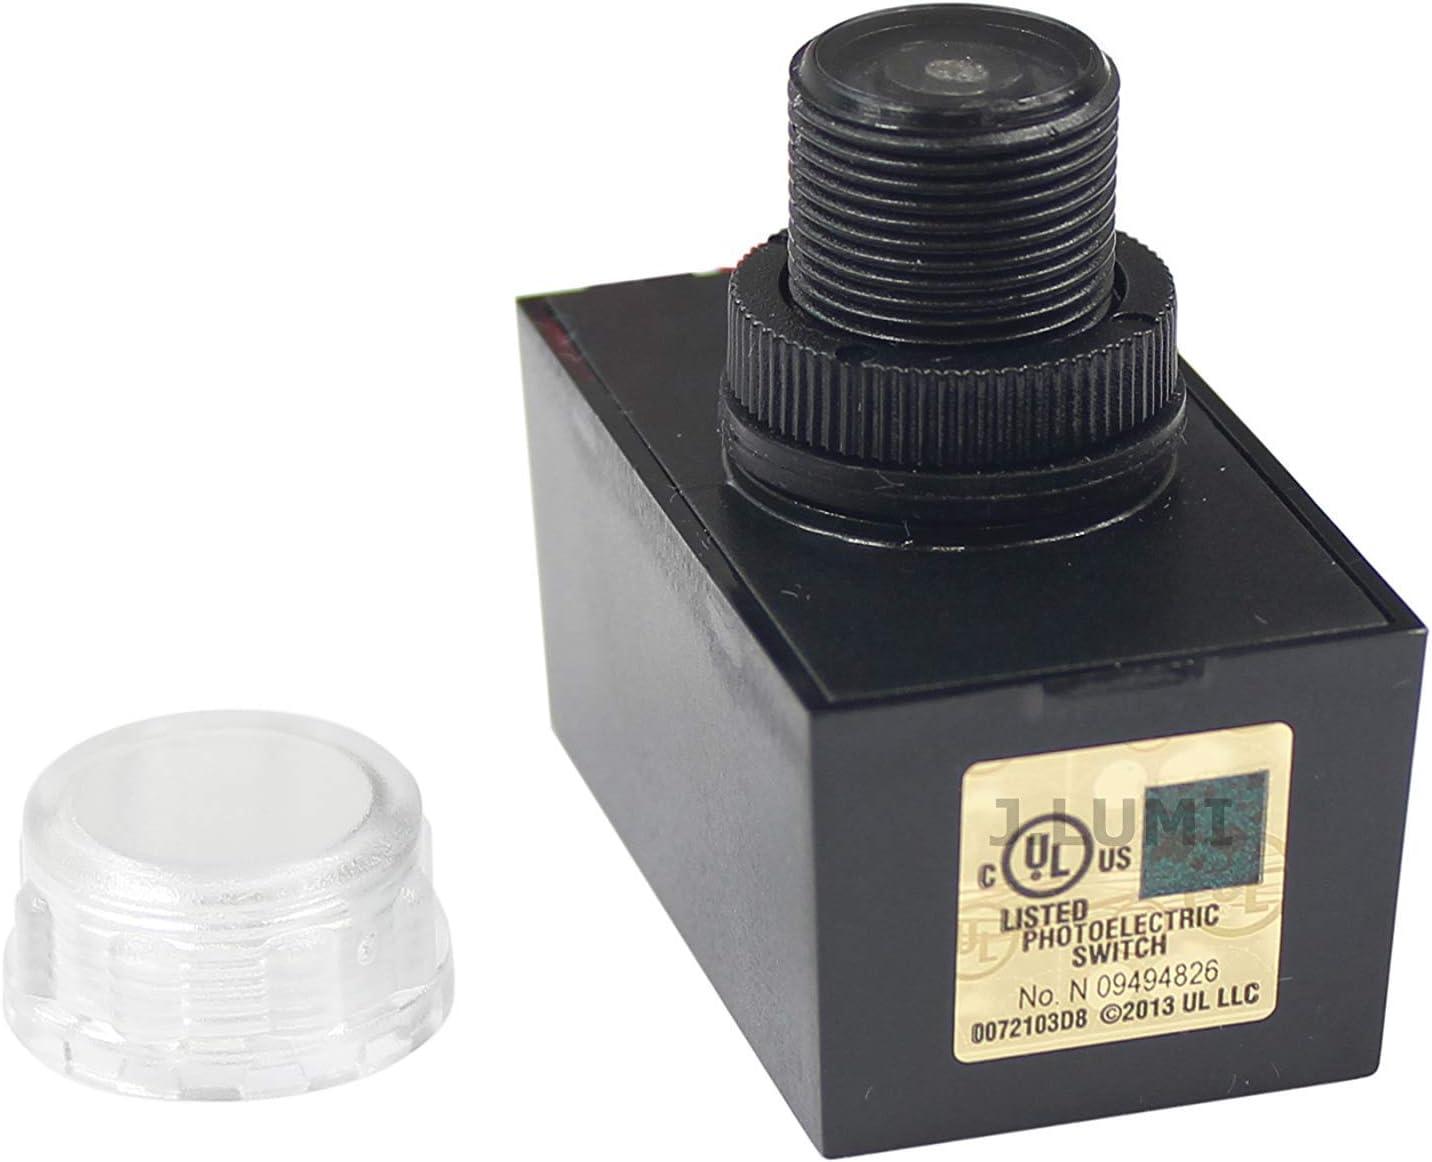 J.LUMI YCA1030 Outdoor Hard-Wired Post Eye Light Control with Photocell Light Sensor Photocell Sensor Dusk to Dawn Light Sensor Photocell for Outdoor Light UL Listed Renewed